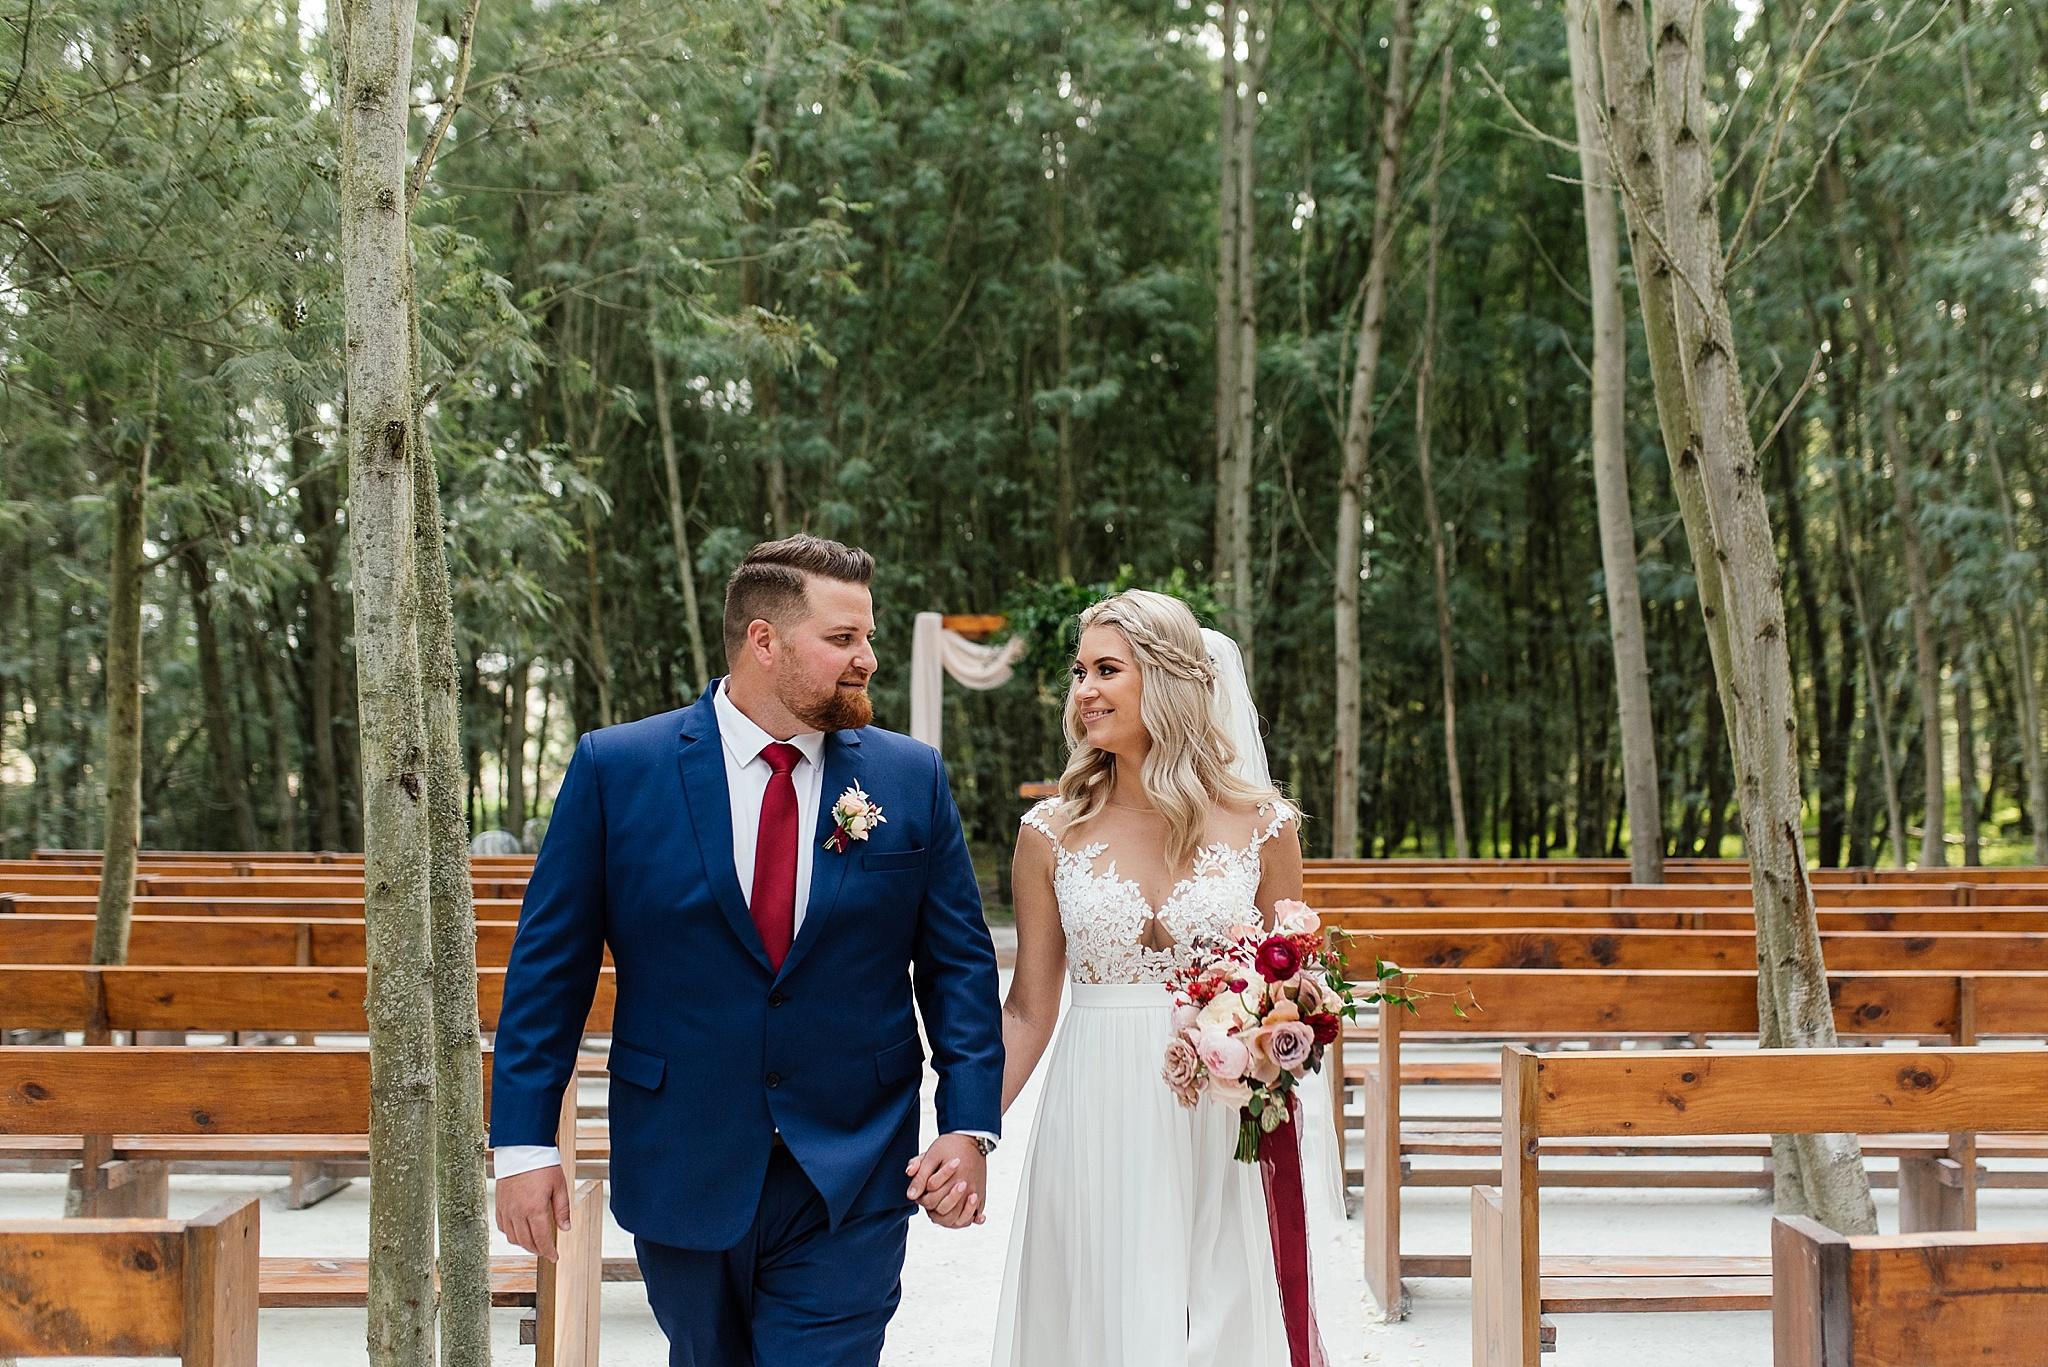 Cape Town Photographer Darren Bester - Die Woud Wedding - Gareth & Roxanne_0001.jpg